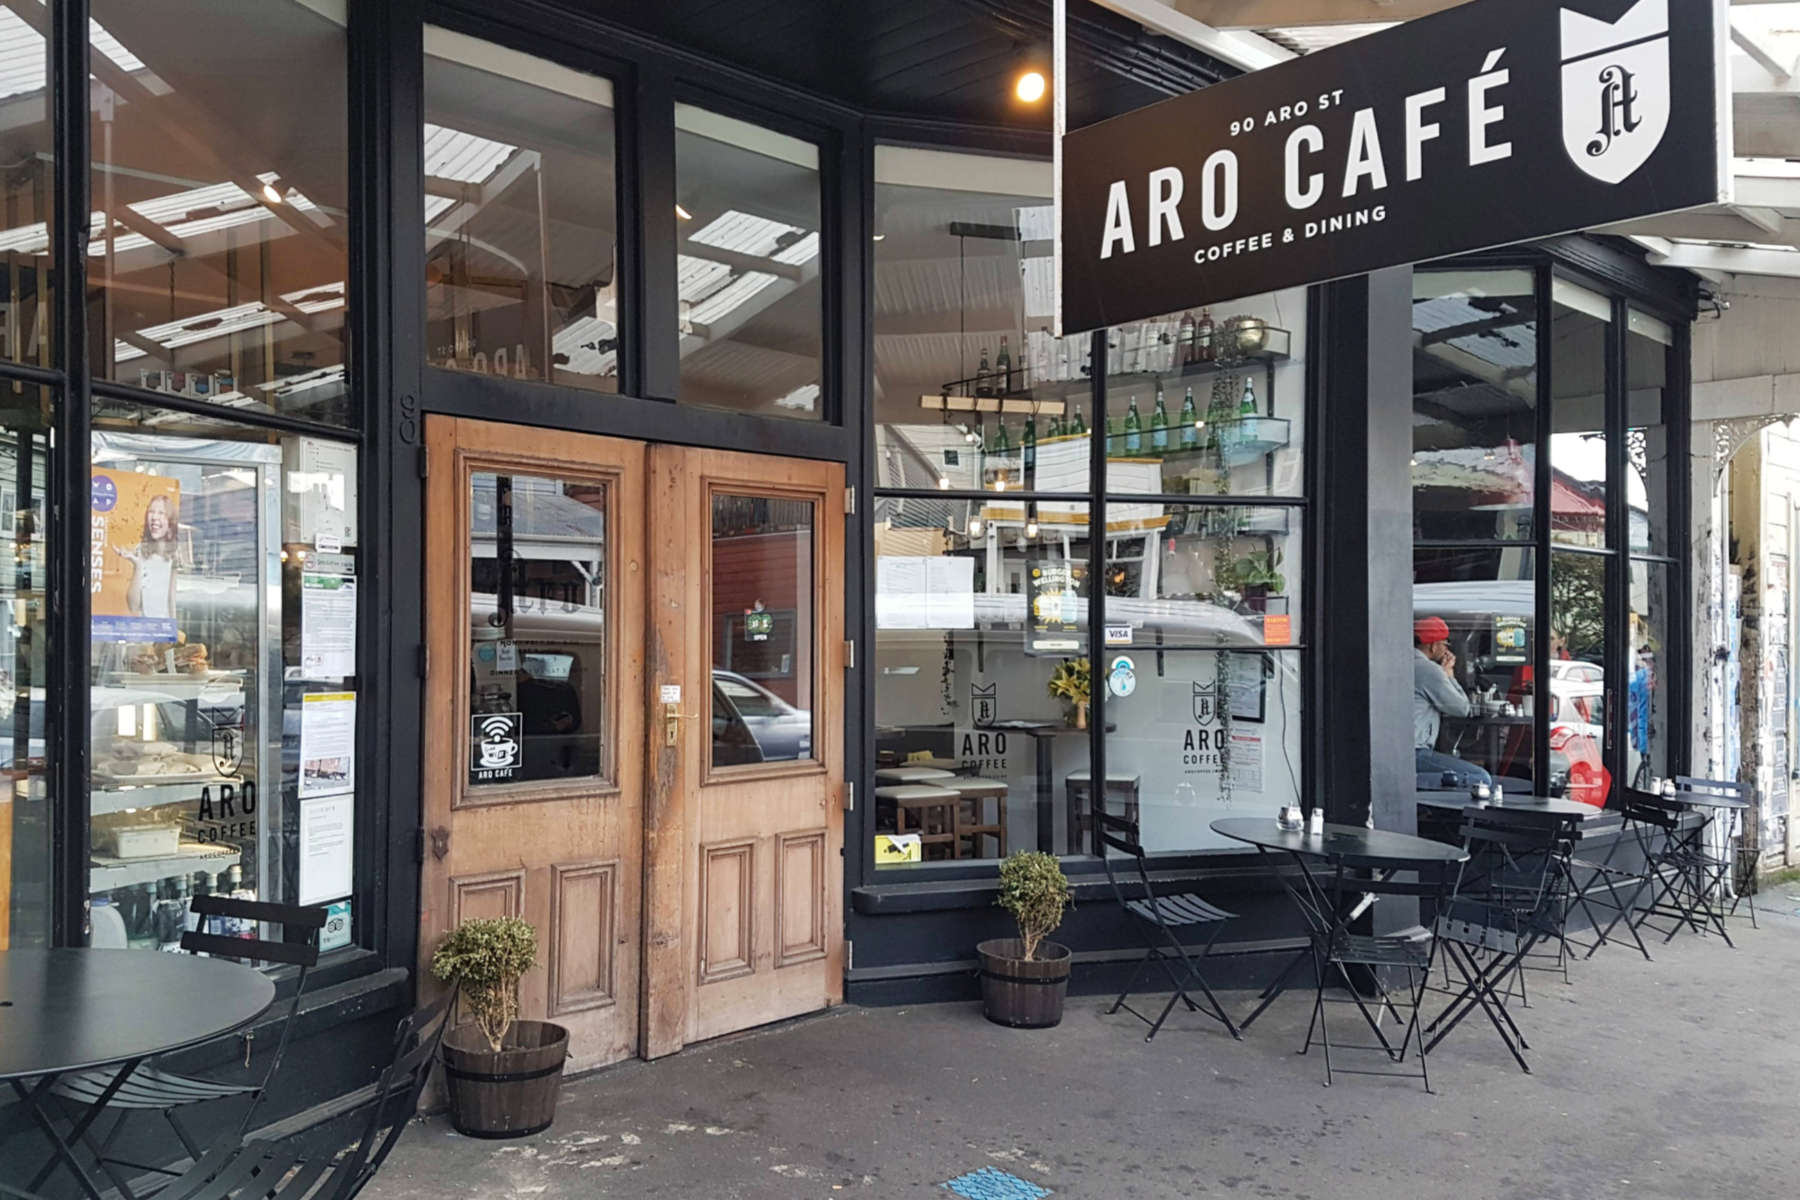 Aro St Cafe exterior